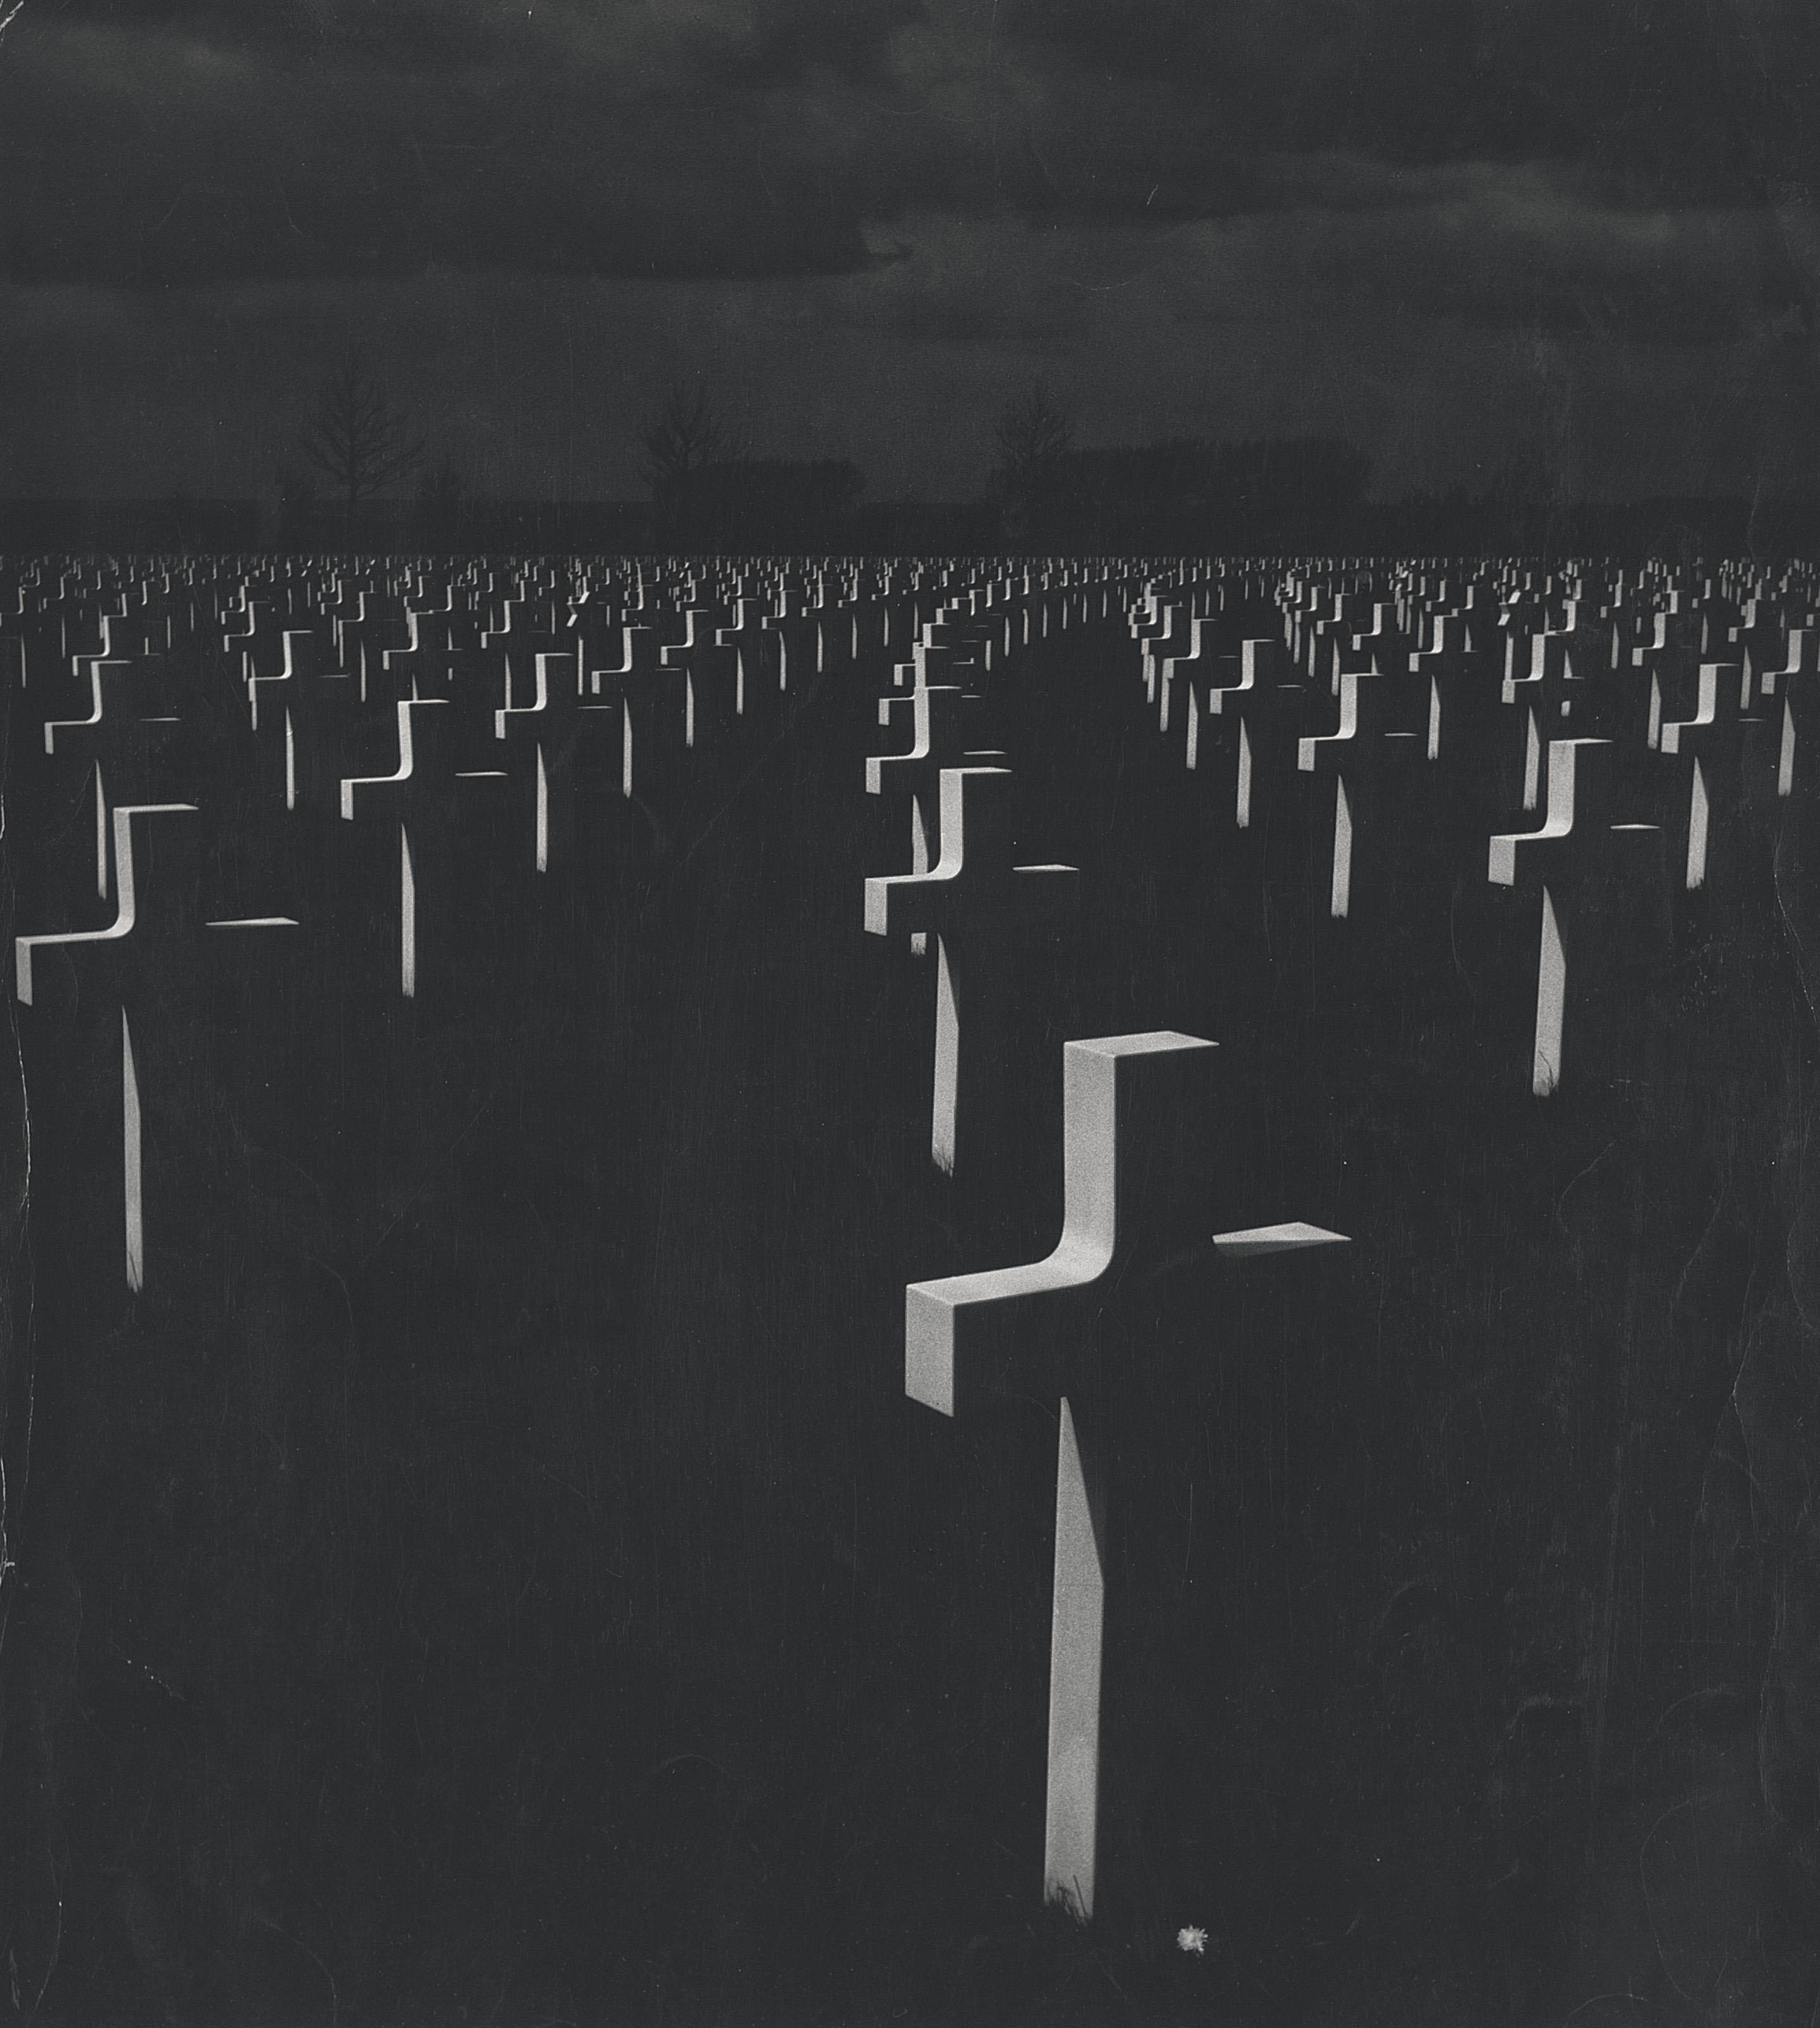 Cemetery at night. c. 1960